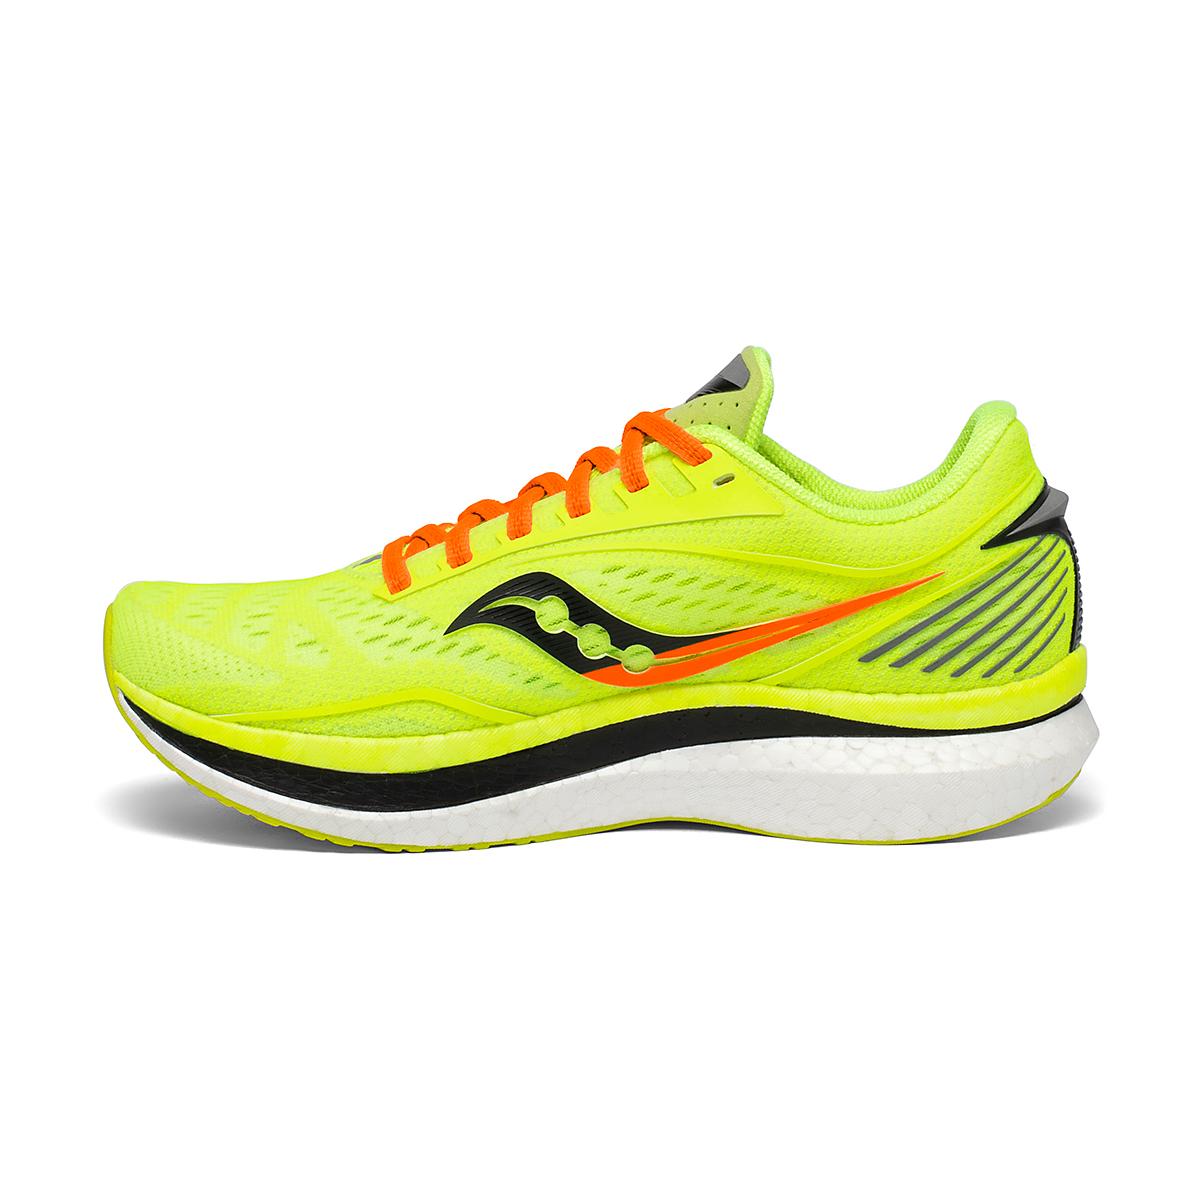 Men's Saucony VIZIPRO Speed Endorphin Speed Running Shoe - Color: Citron - Size: 7 - Width: Regular, Citron, large, image 2